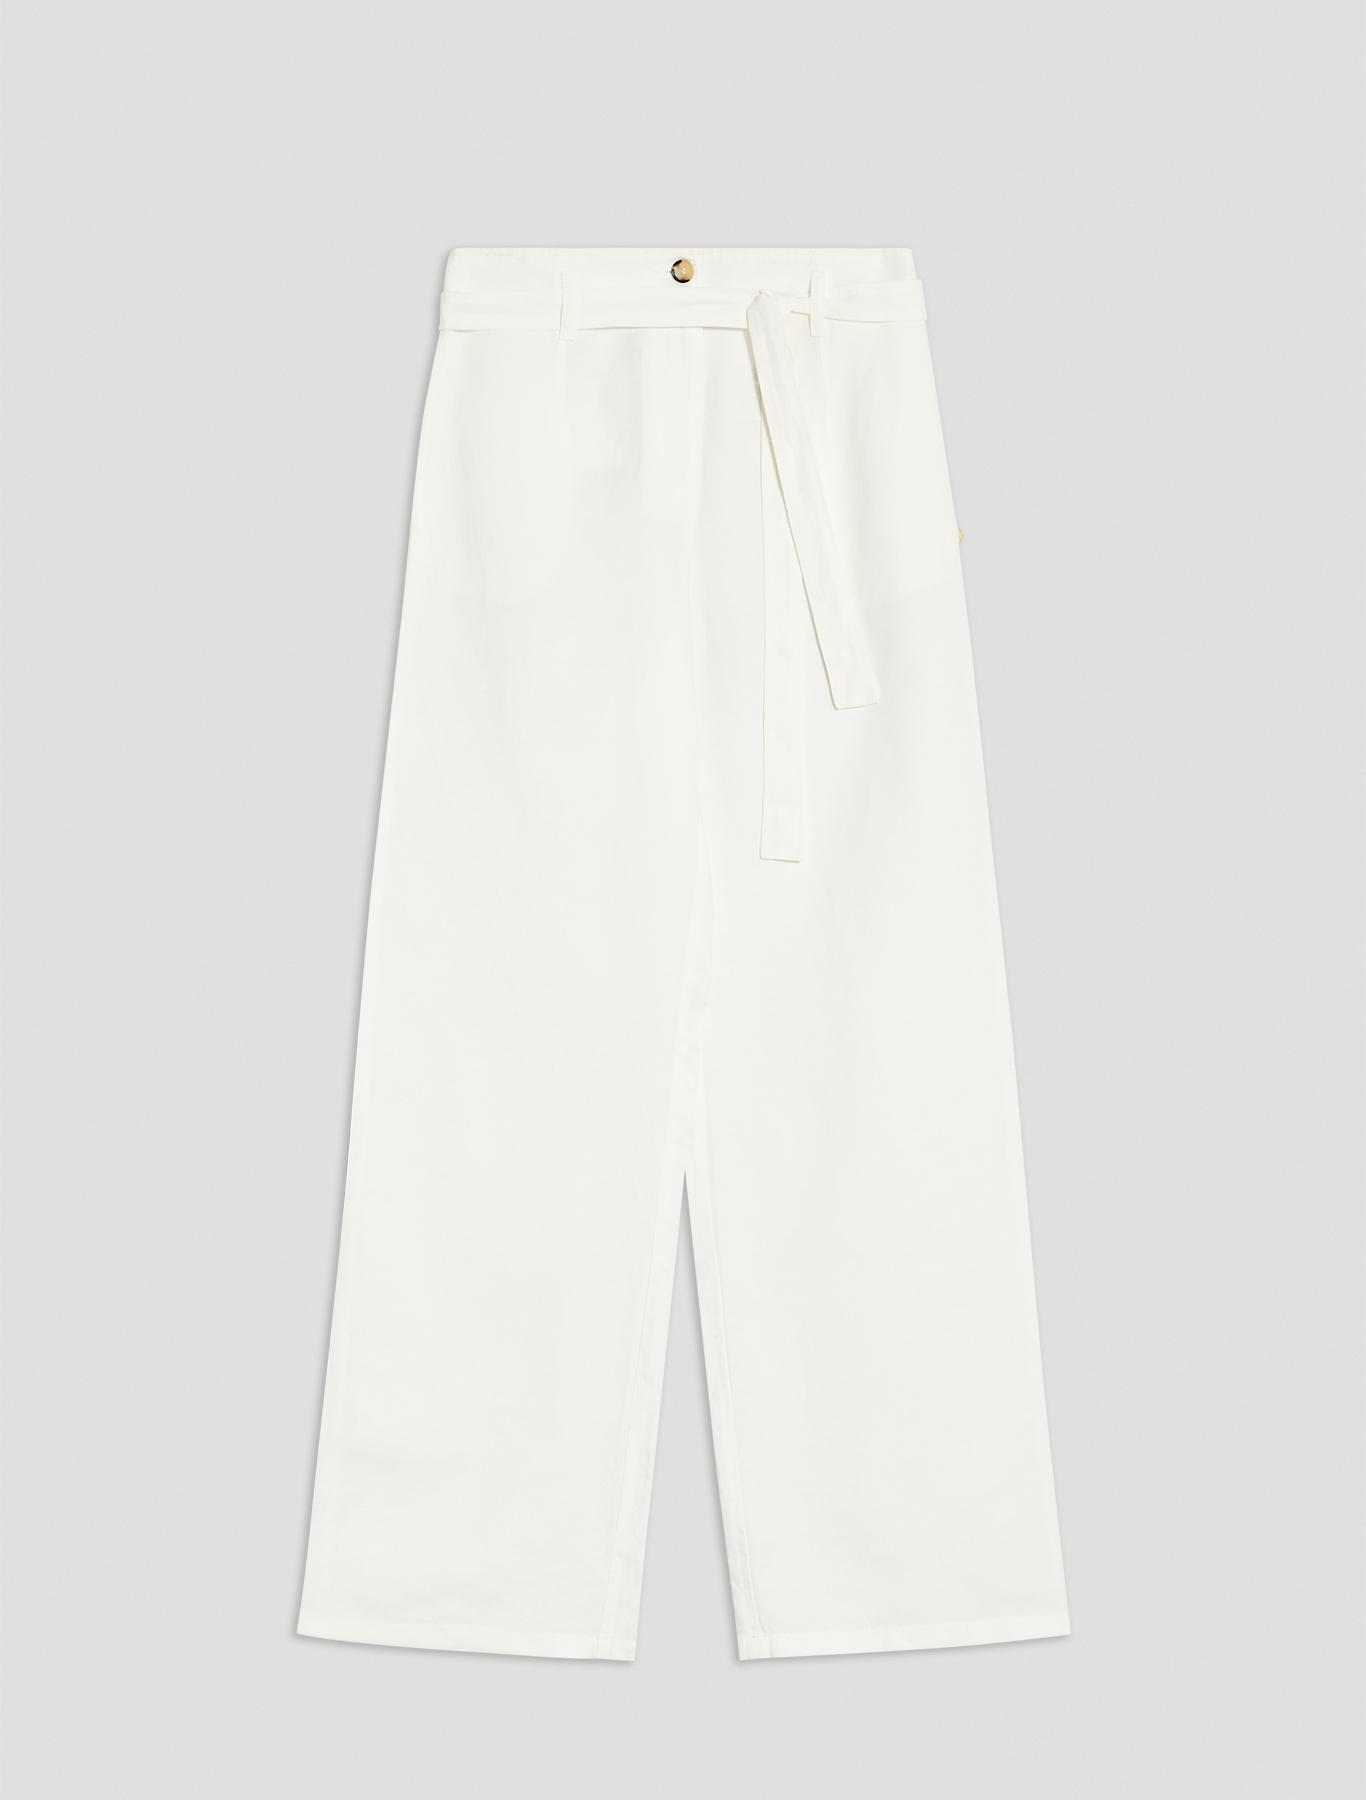 Linen blend trousers - white - pennyblack